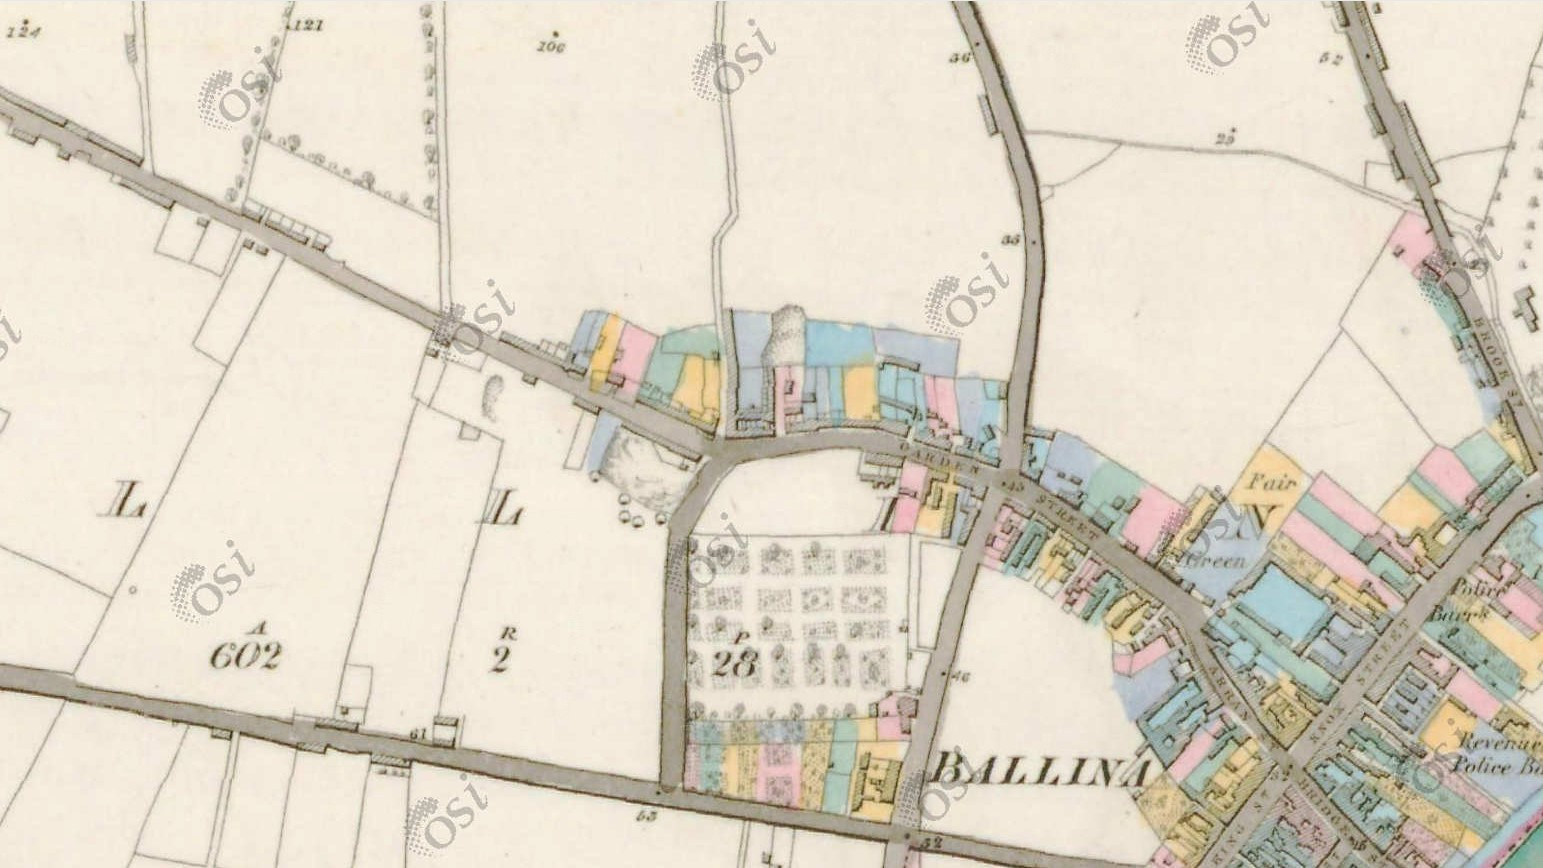 Ordnance Survey 6 inch to Mile map, Garden Street 1837